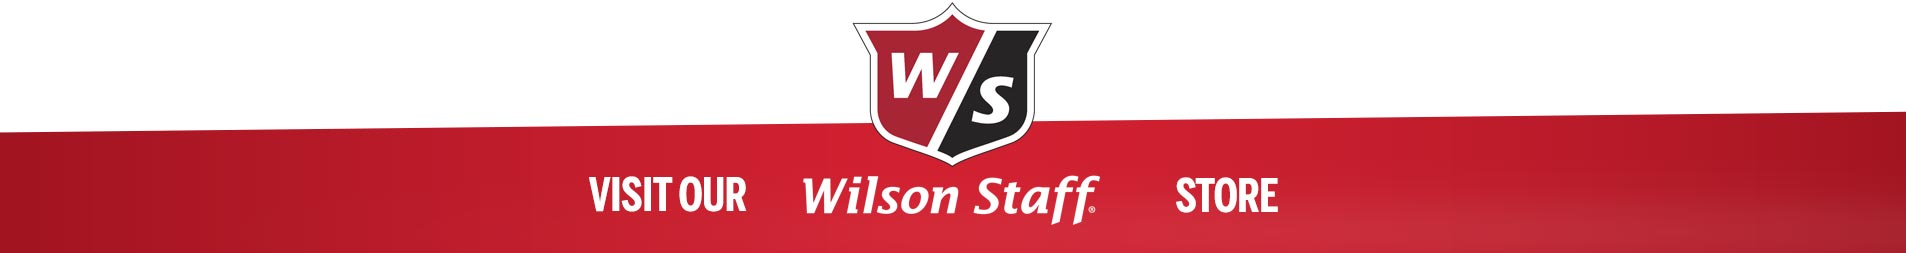 Wilson Staff C300